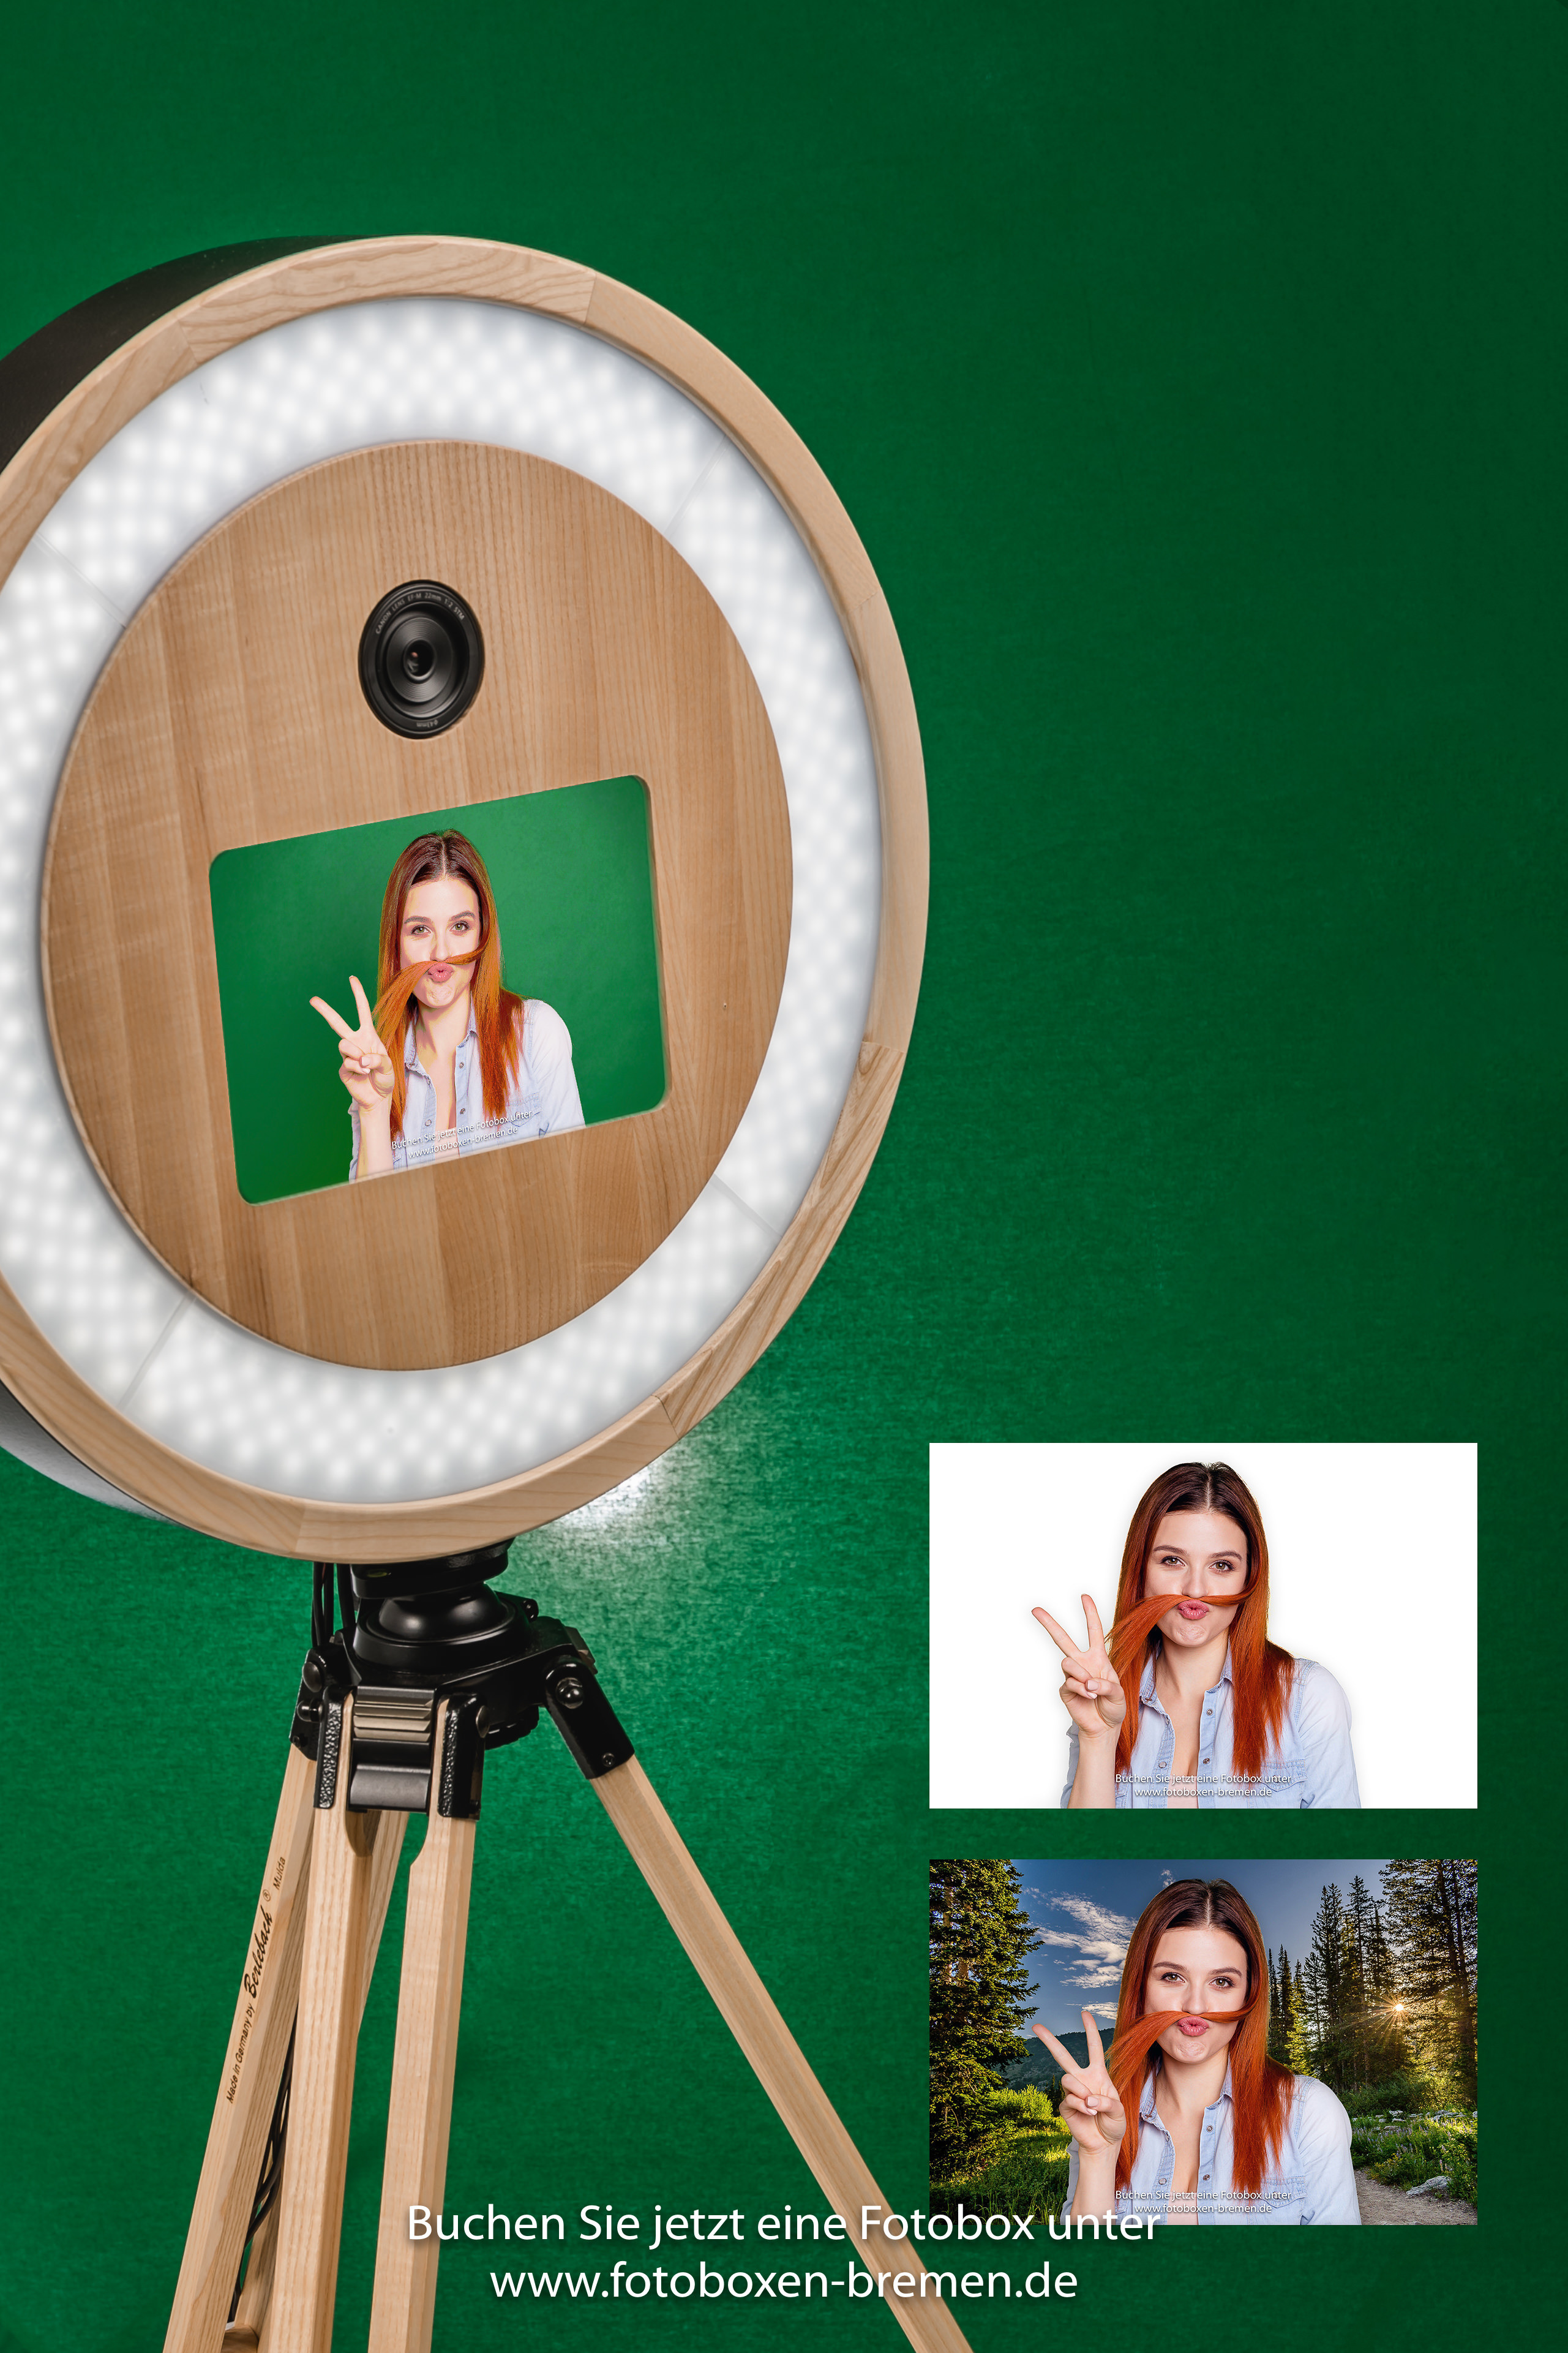 fotobox bremen greenscreen - Fotobox Bremen mieten